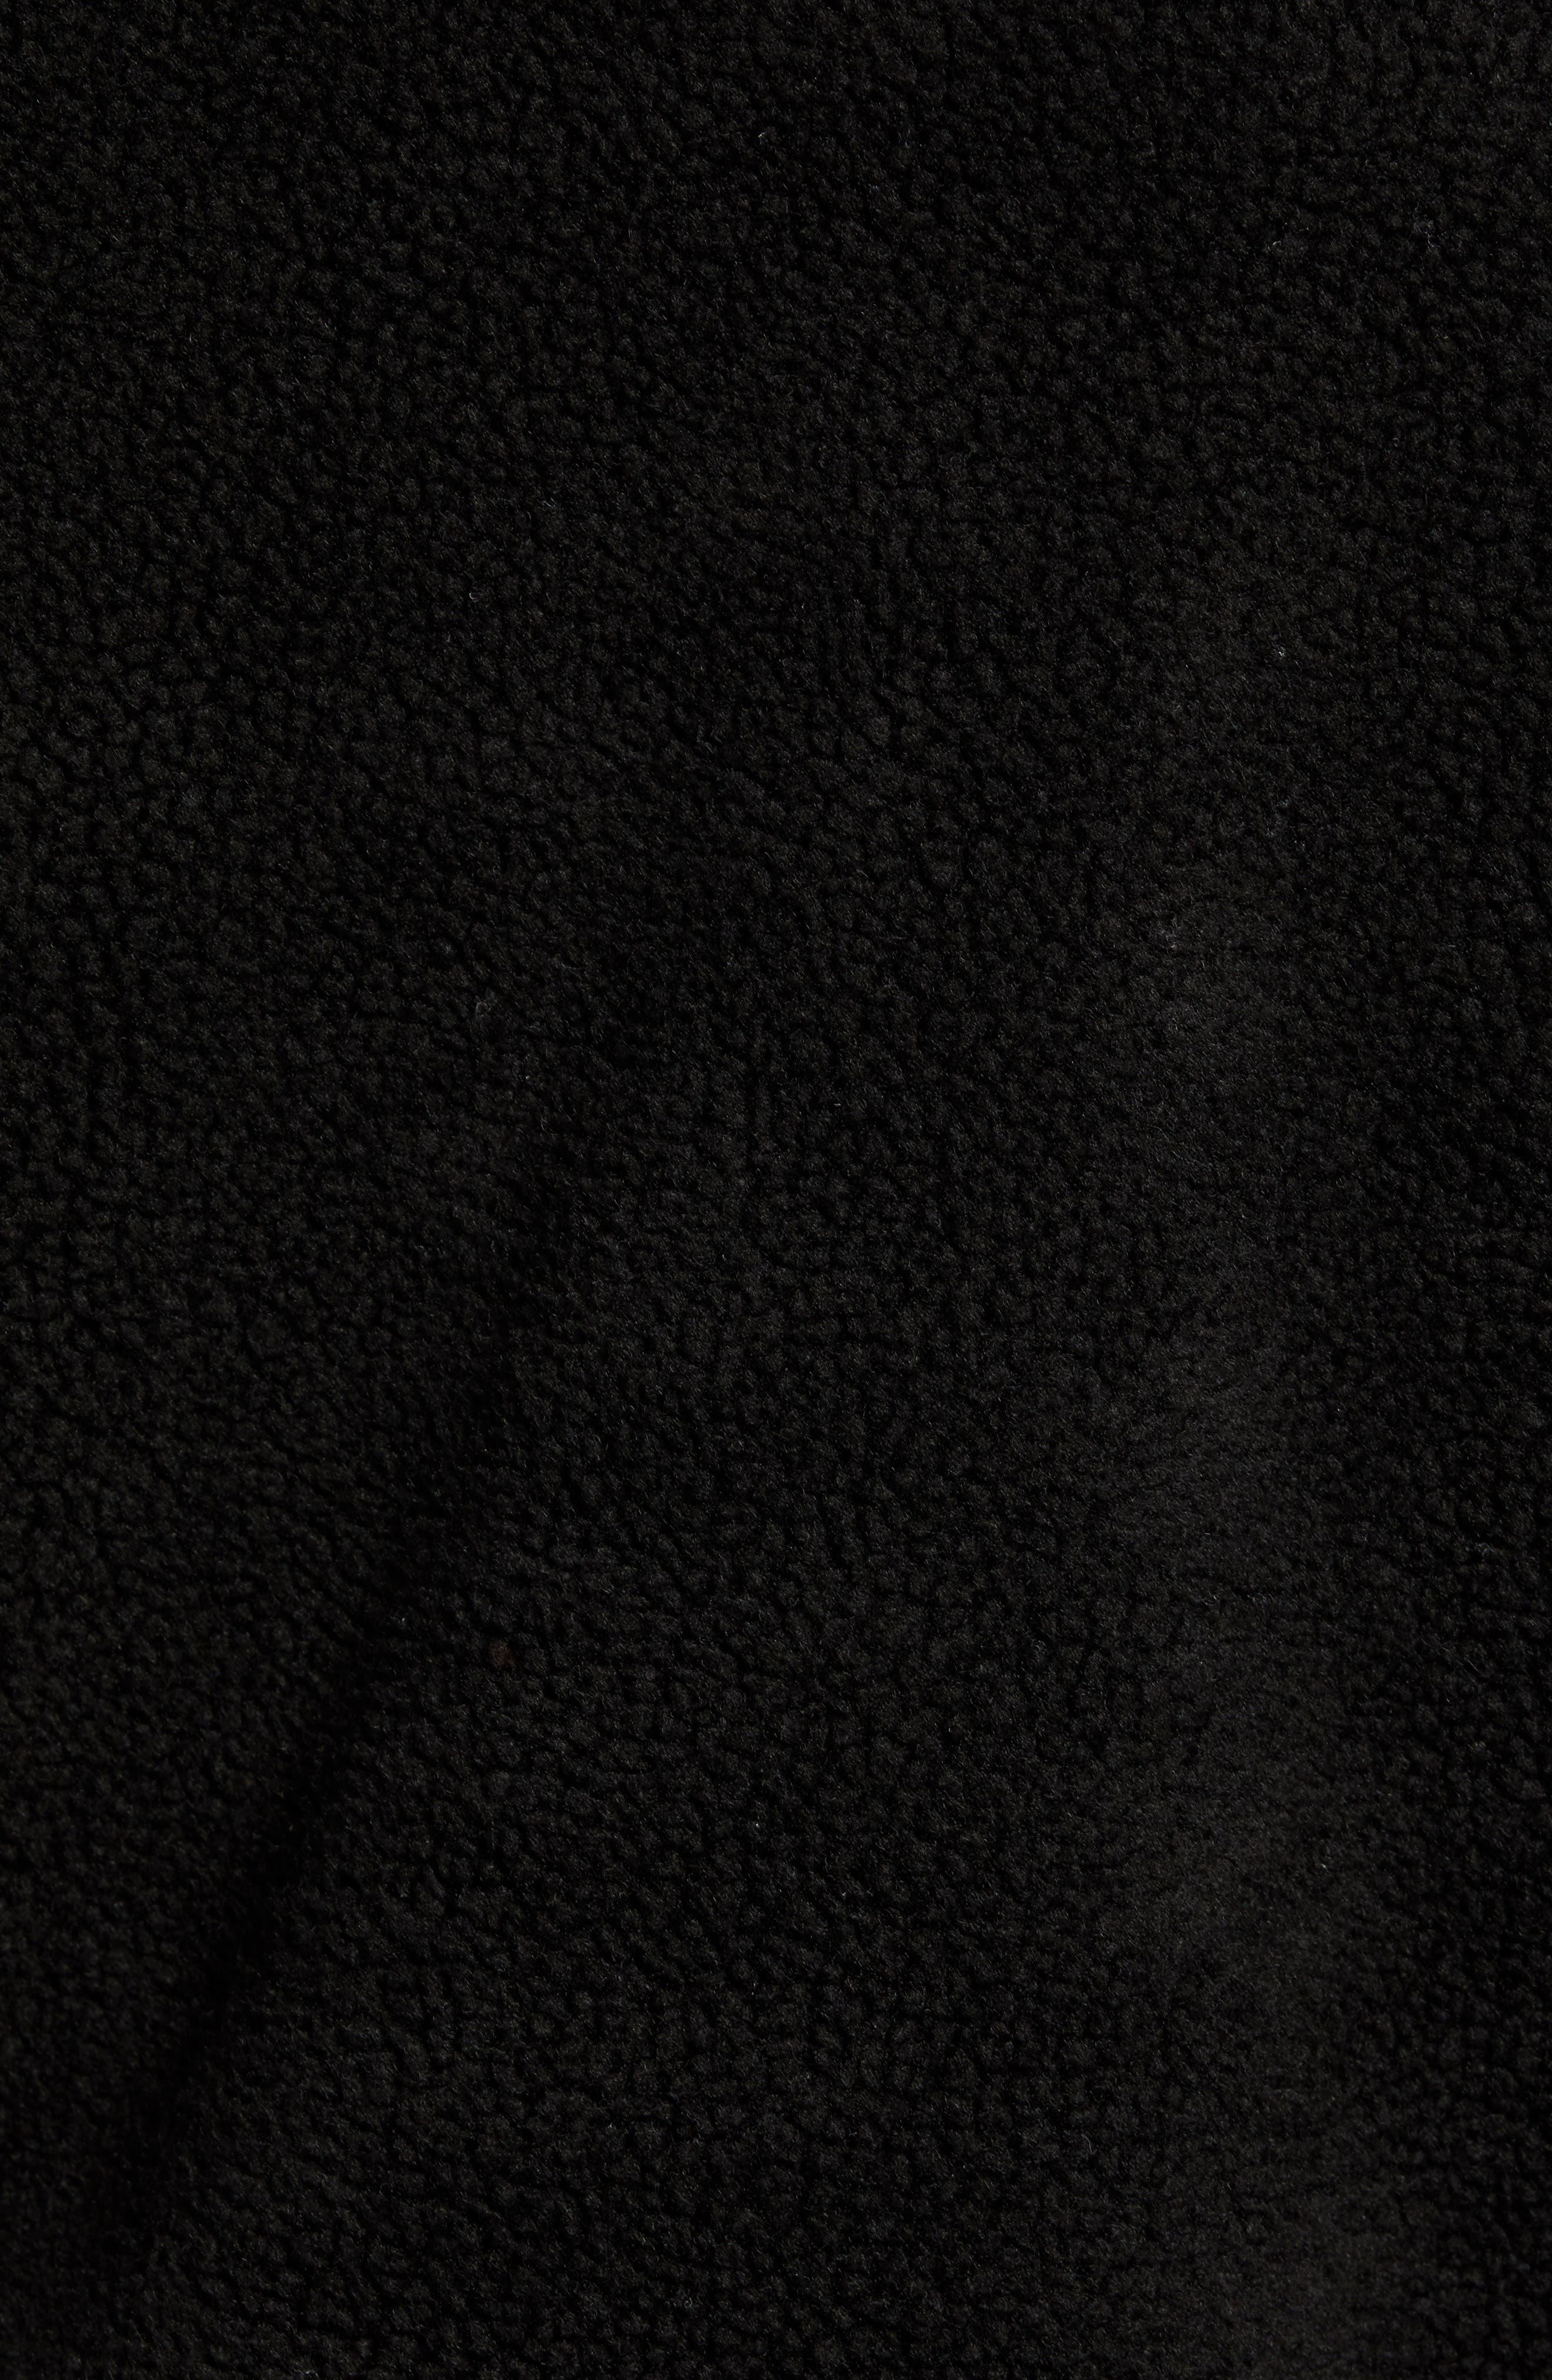 Tech Icon Fleece Zip Hoodie,                             Alternate thumbnail 6, color,                             BLACK/ BLACK